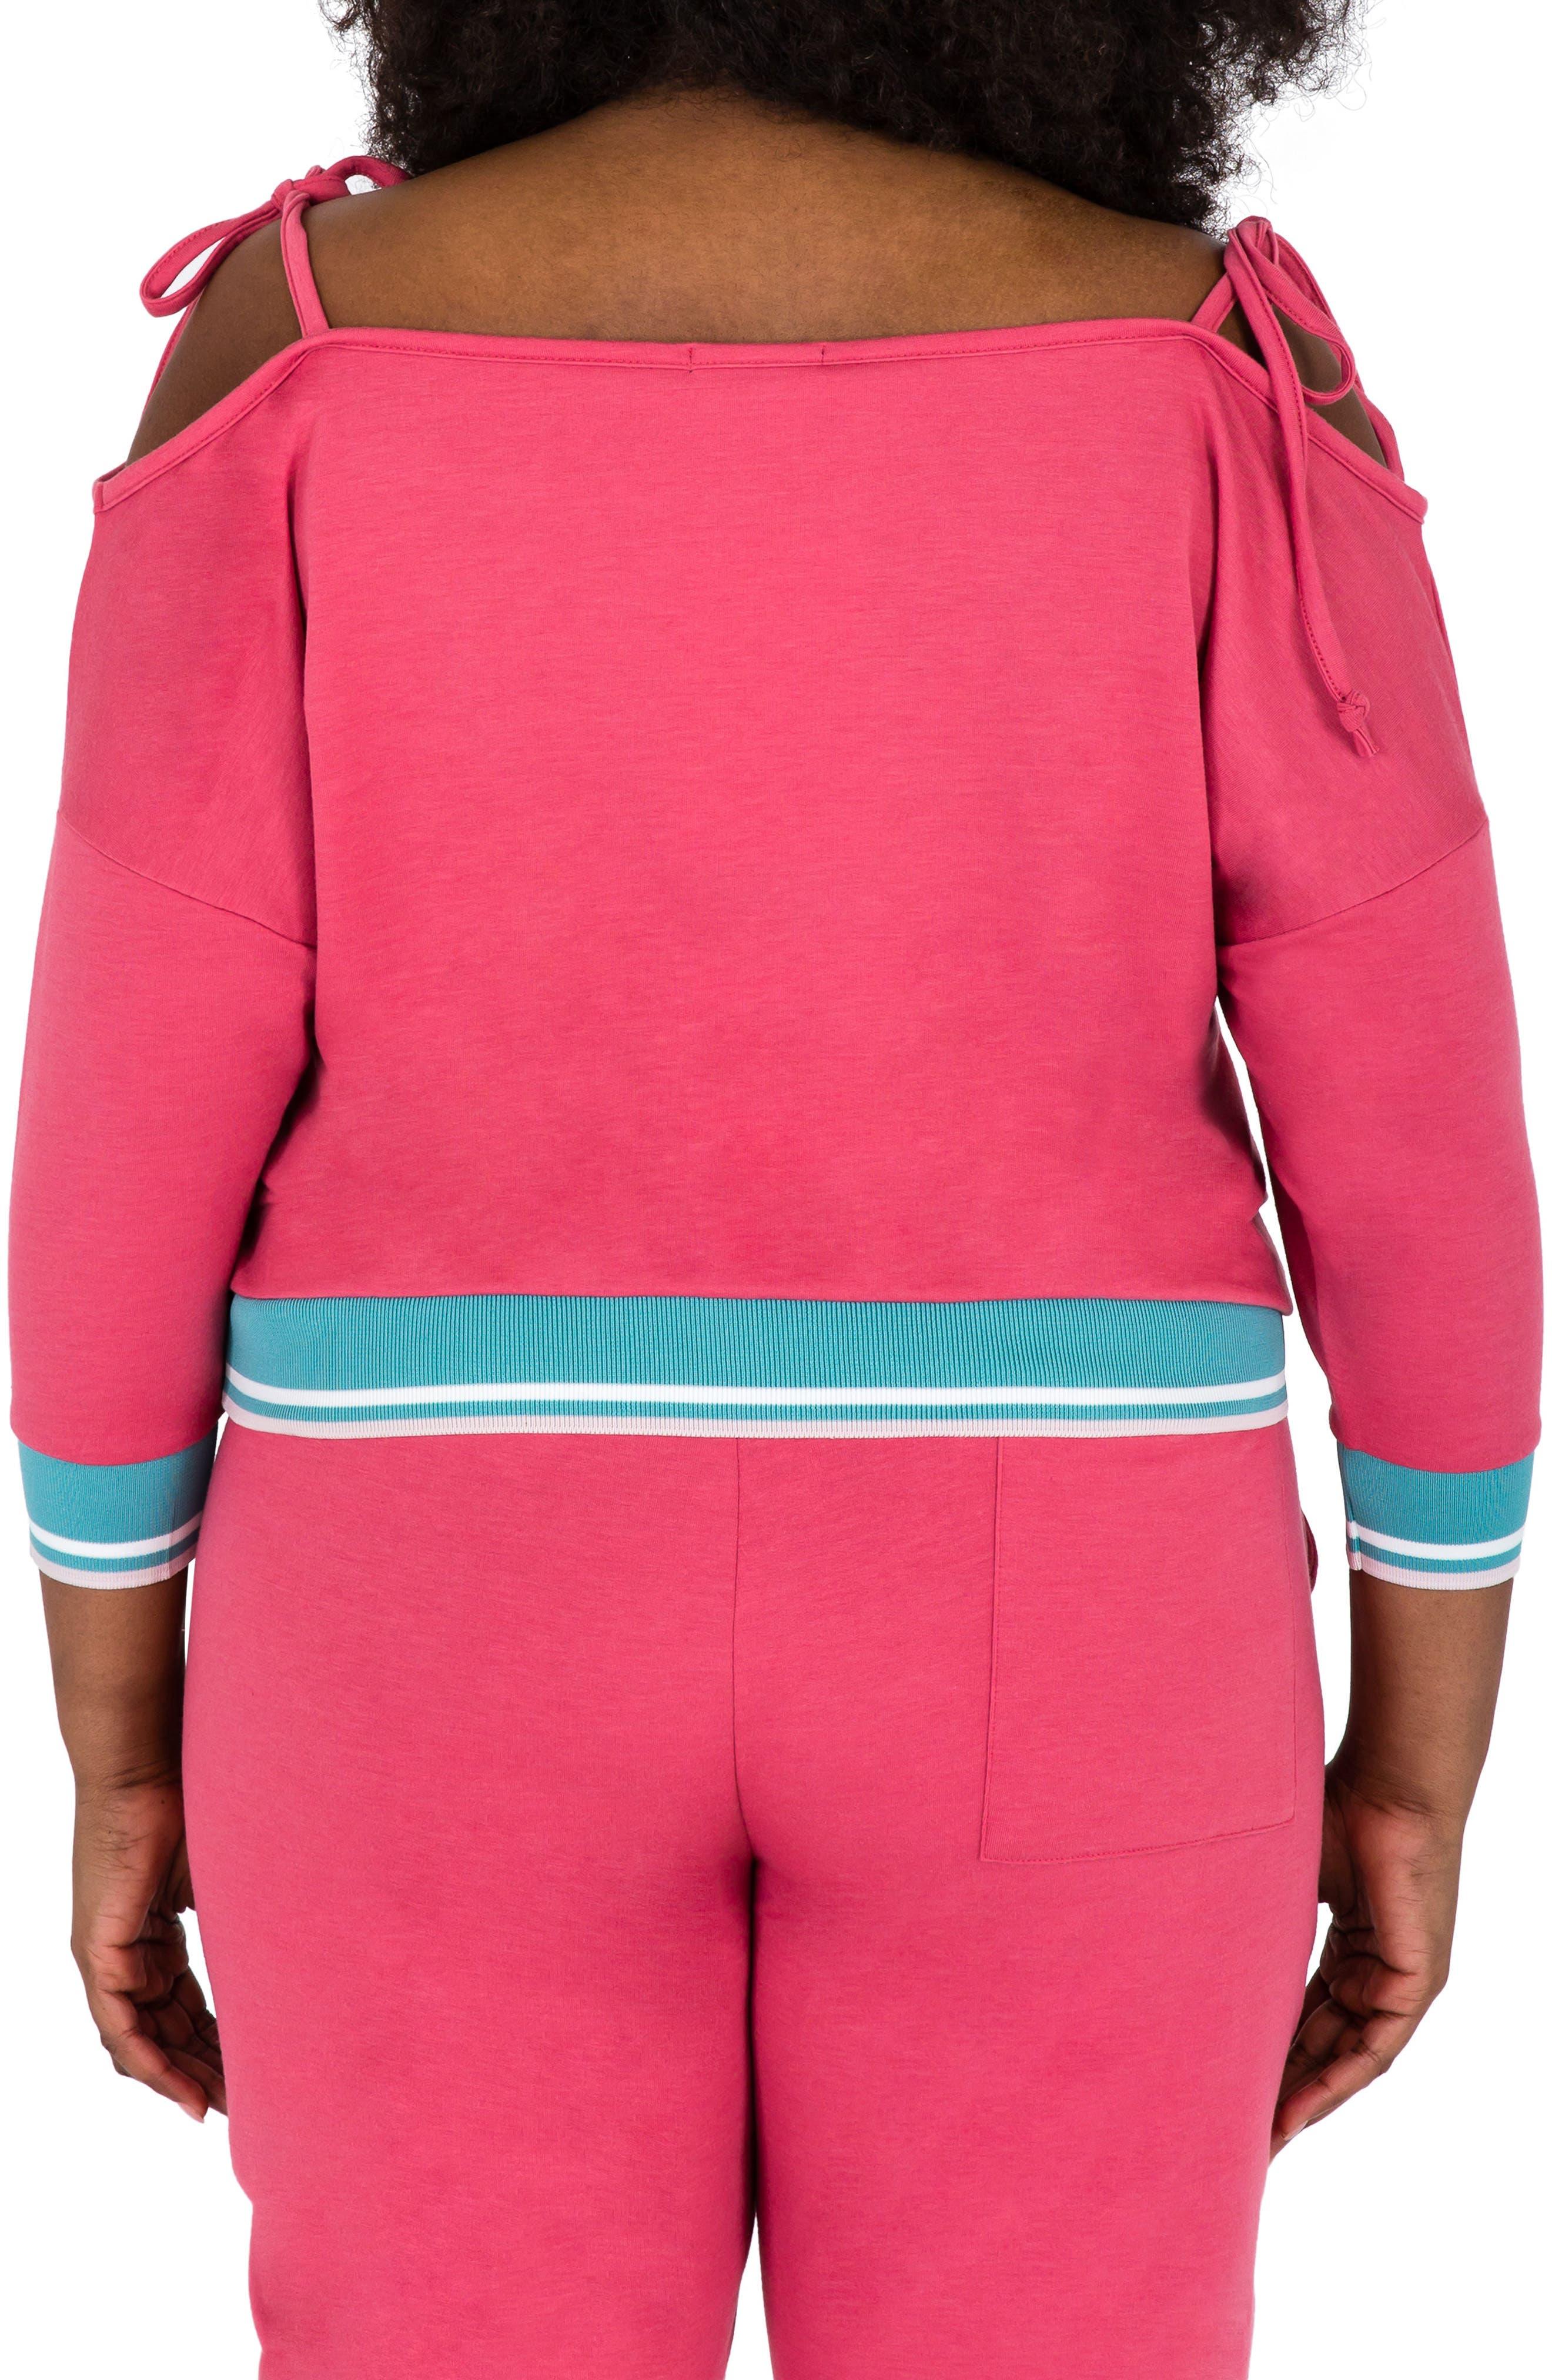 Janae Convertible Knit Top,                             Alternate thumbnail 2, color,                             Deep Rose Pink